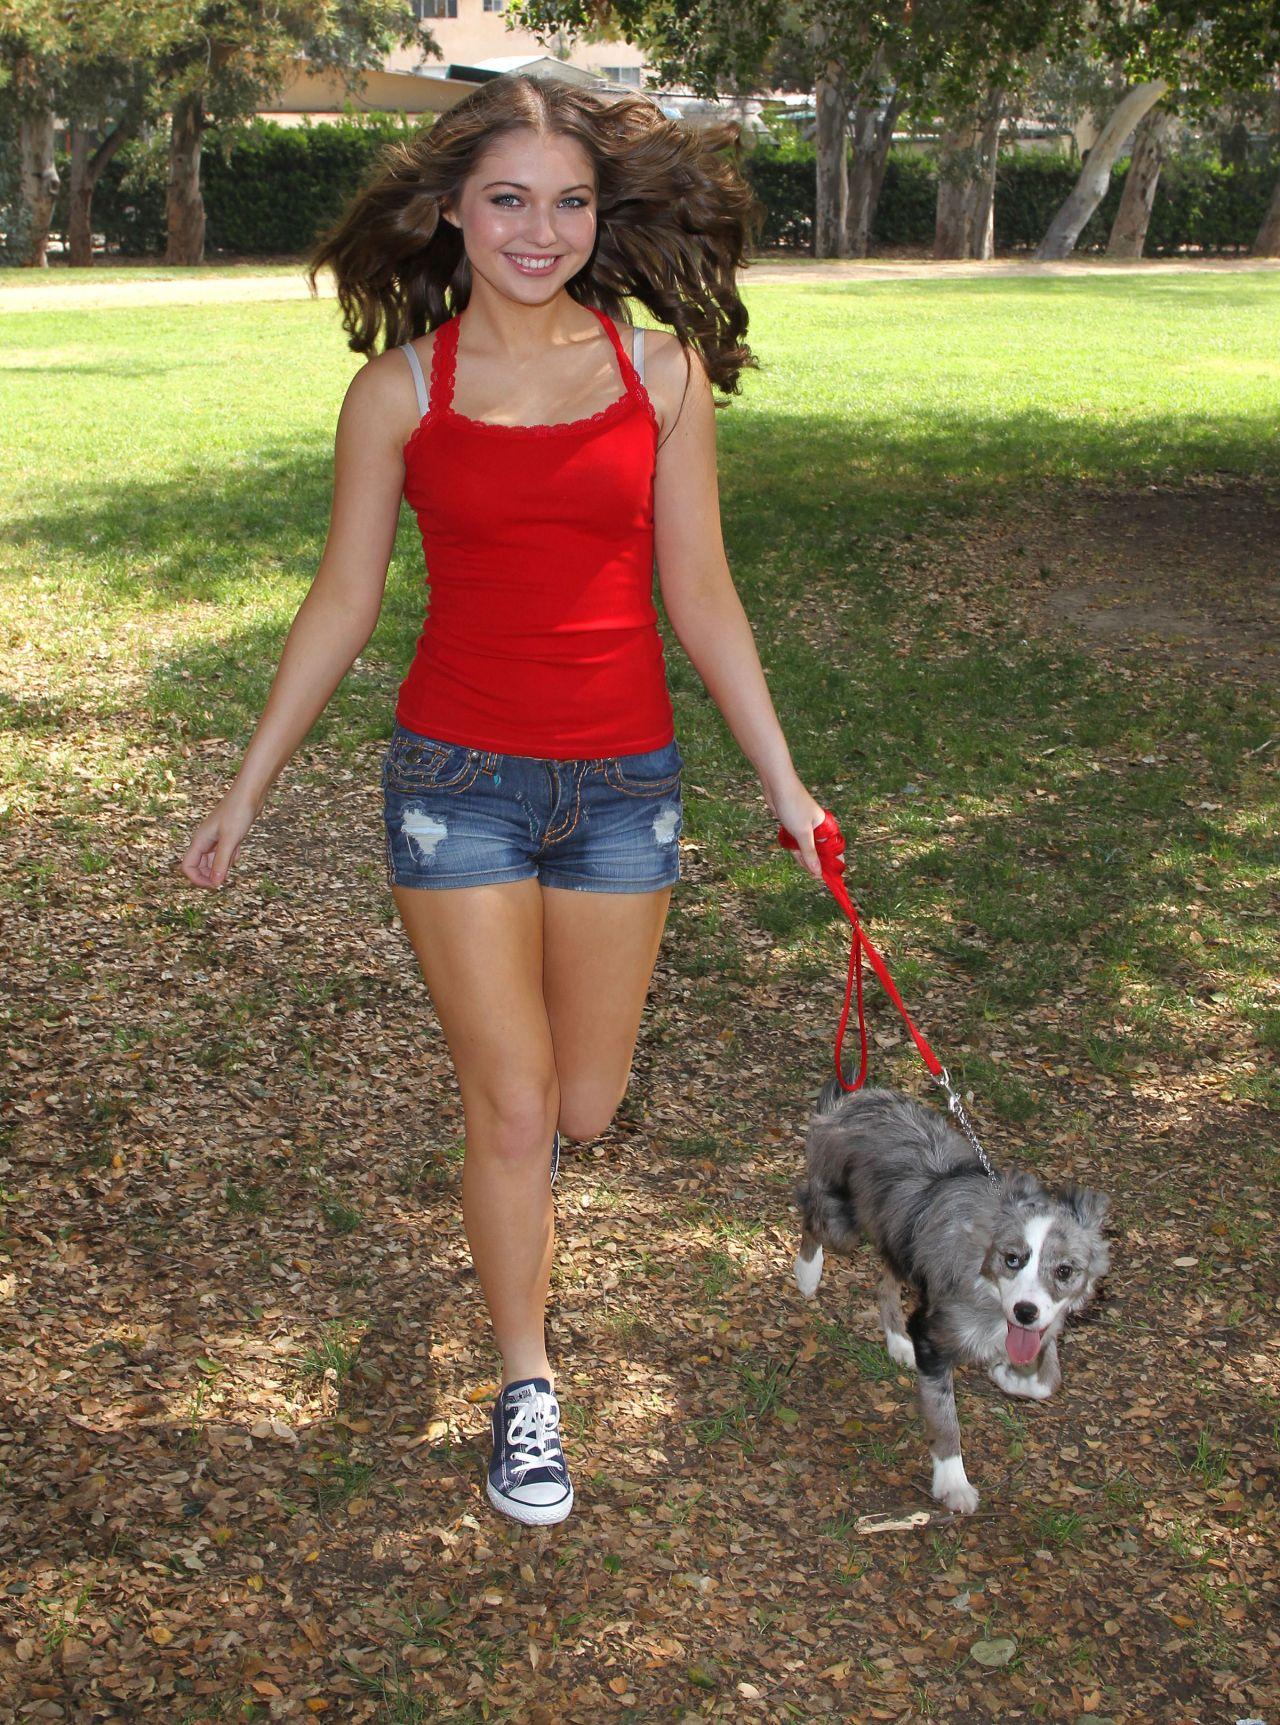 Sammi Hanratty Leggy Photos - in Park in North Hollywood